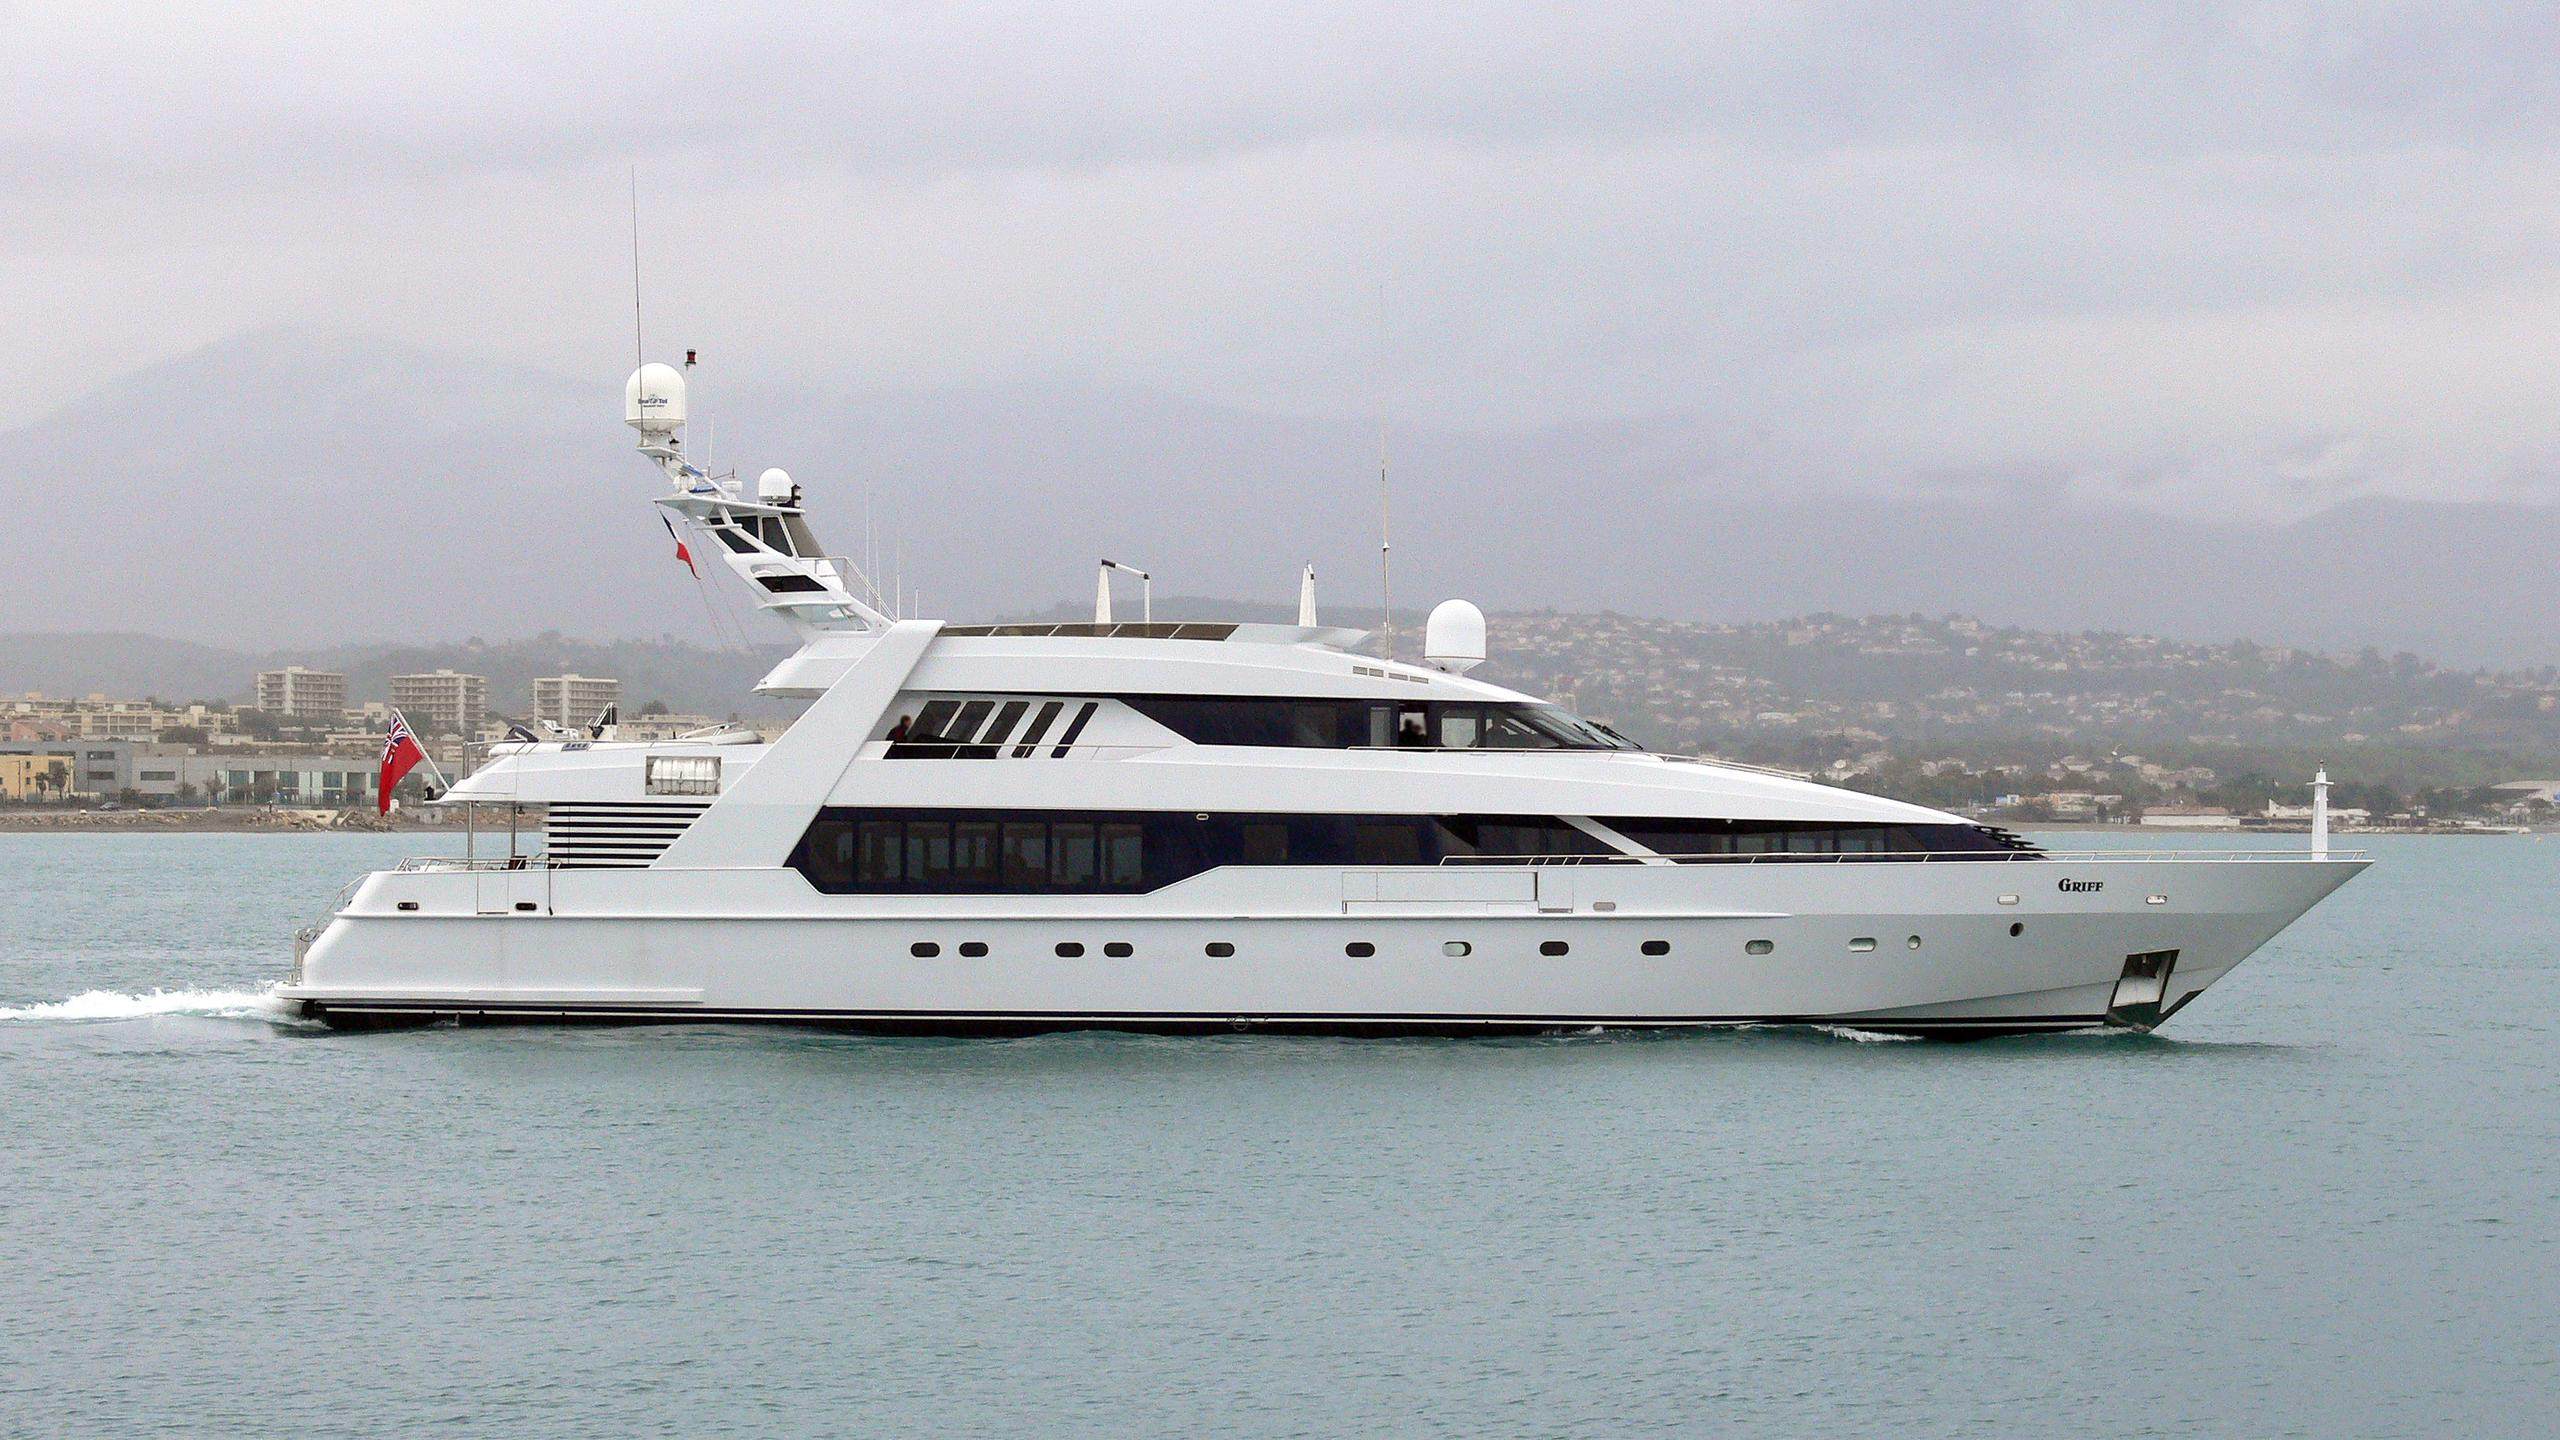 o-leanna-motor-yacht-marinteknik-verkstads-ab-sweden-1994-43m-profile